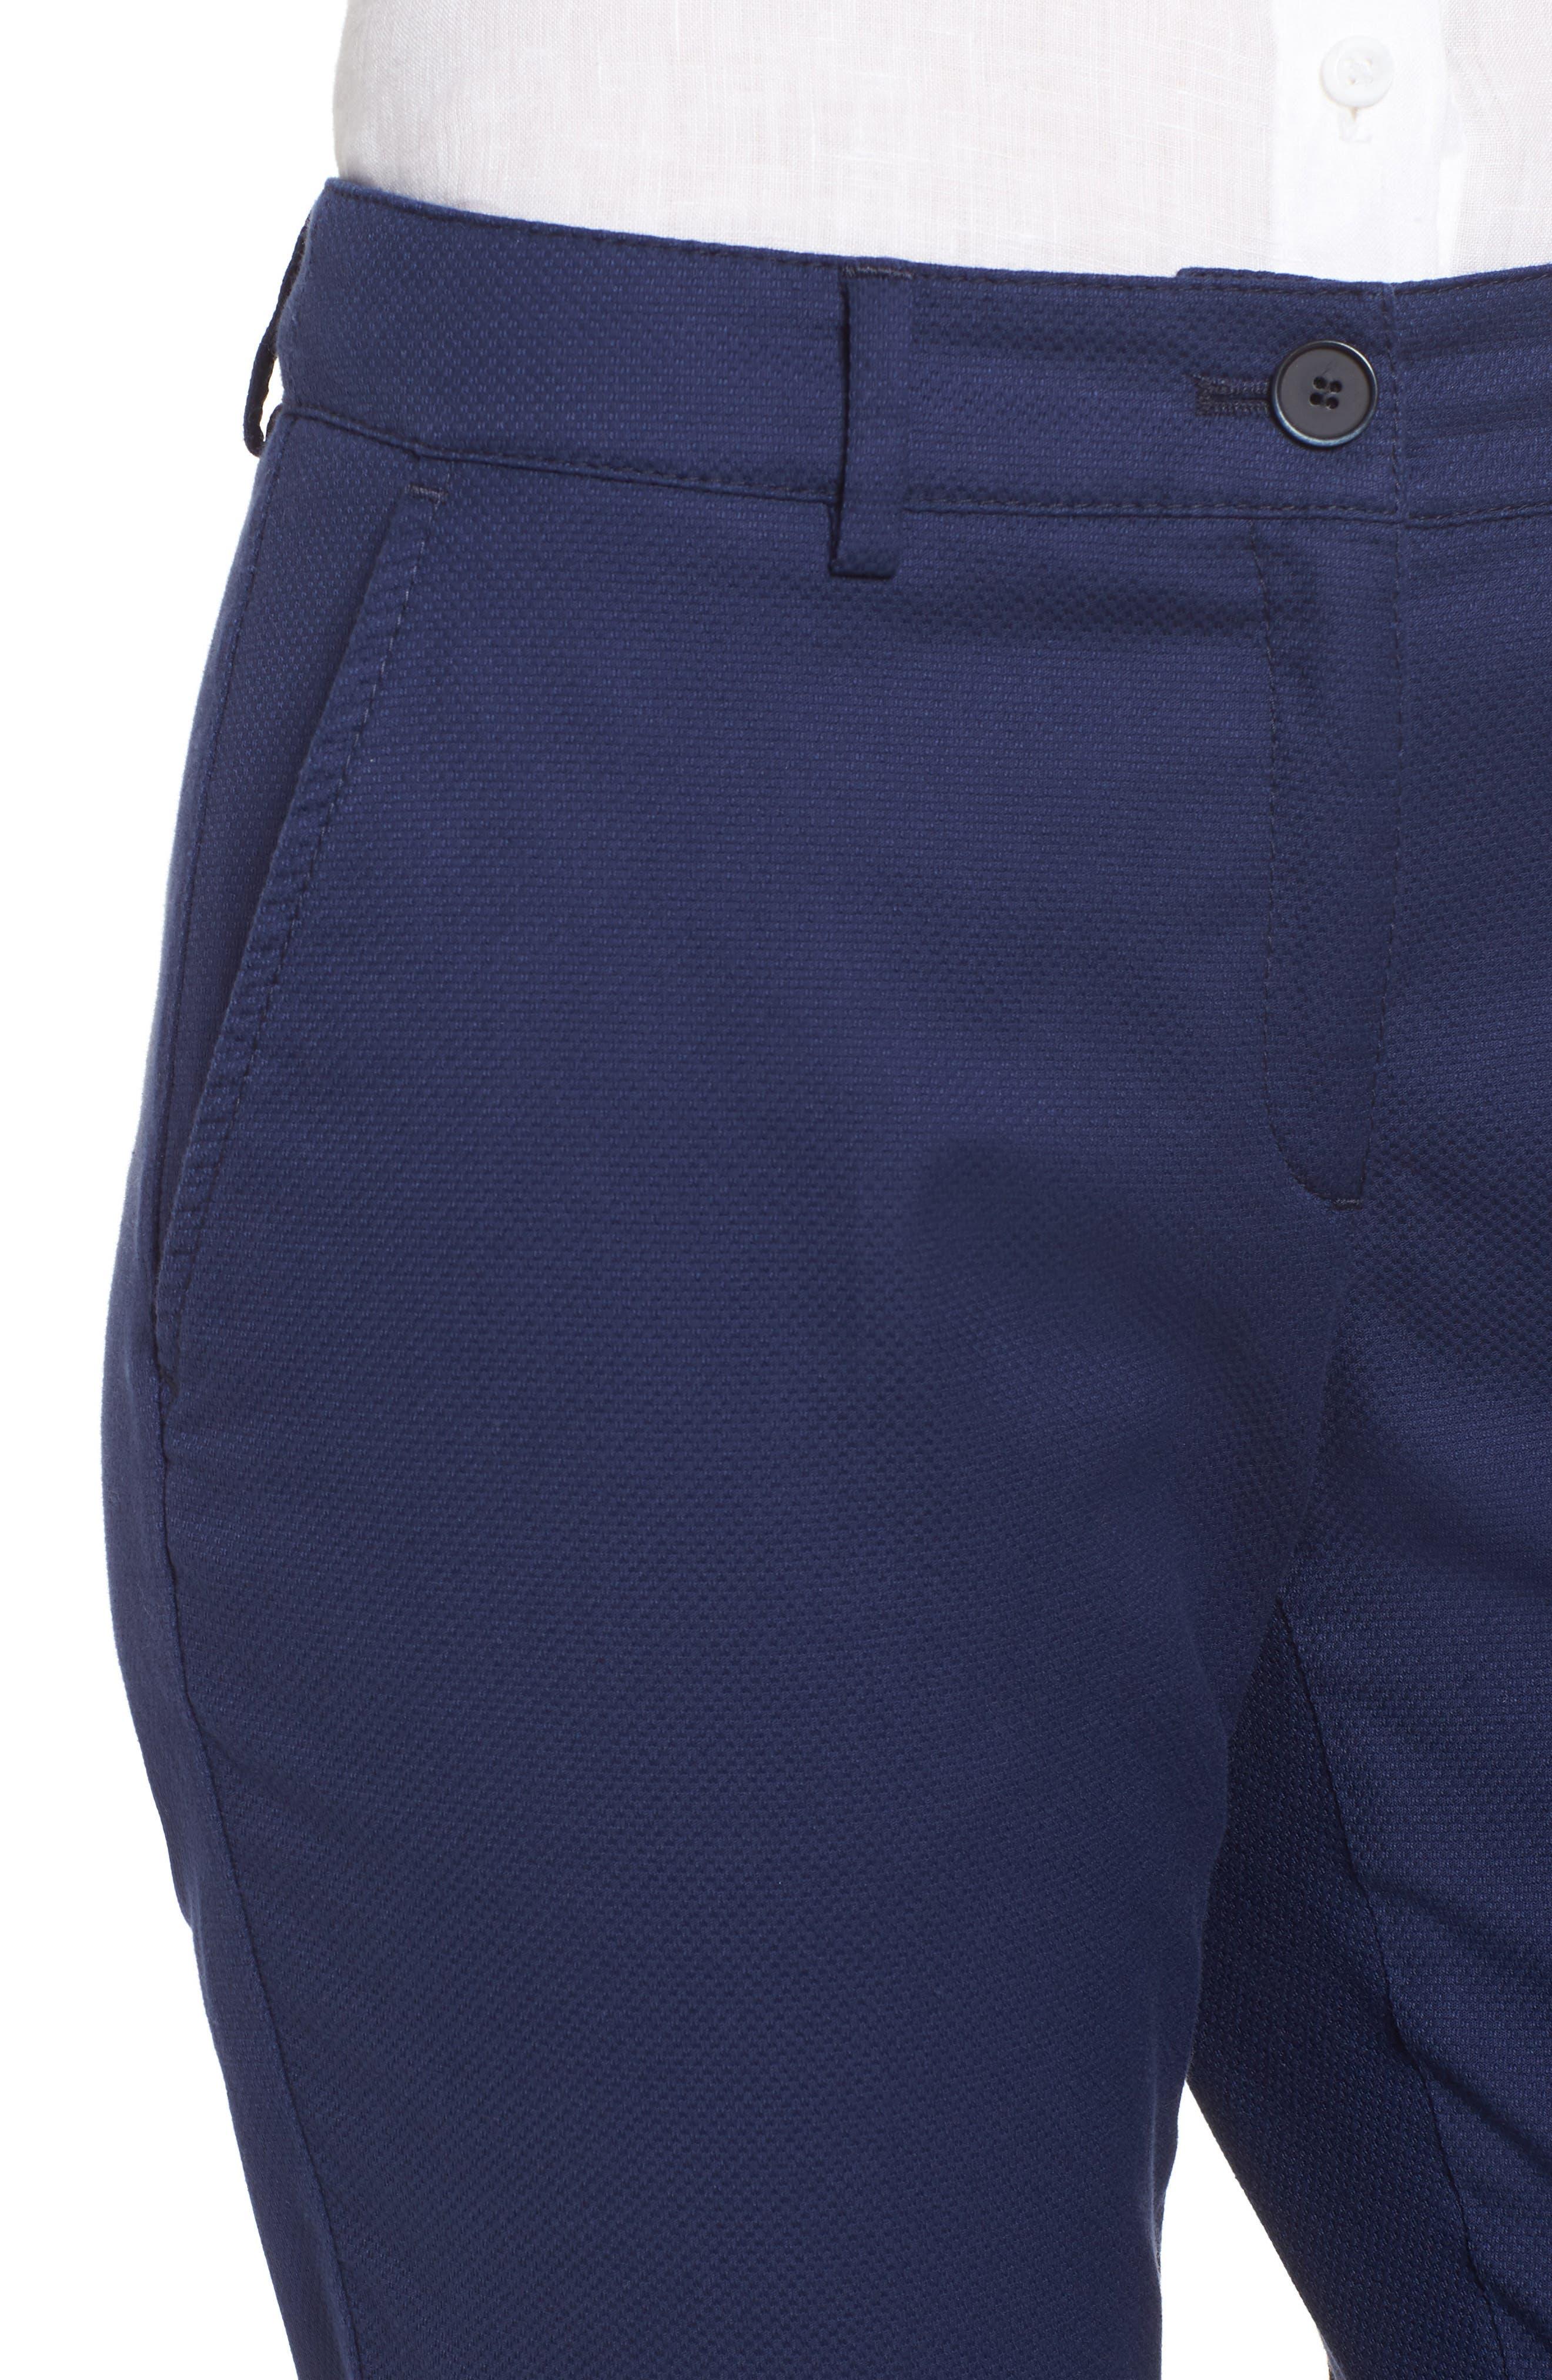 Maron Cuffed Straight Leg Pants,                             Alternate thumbnail 4, color,                             Navy